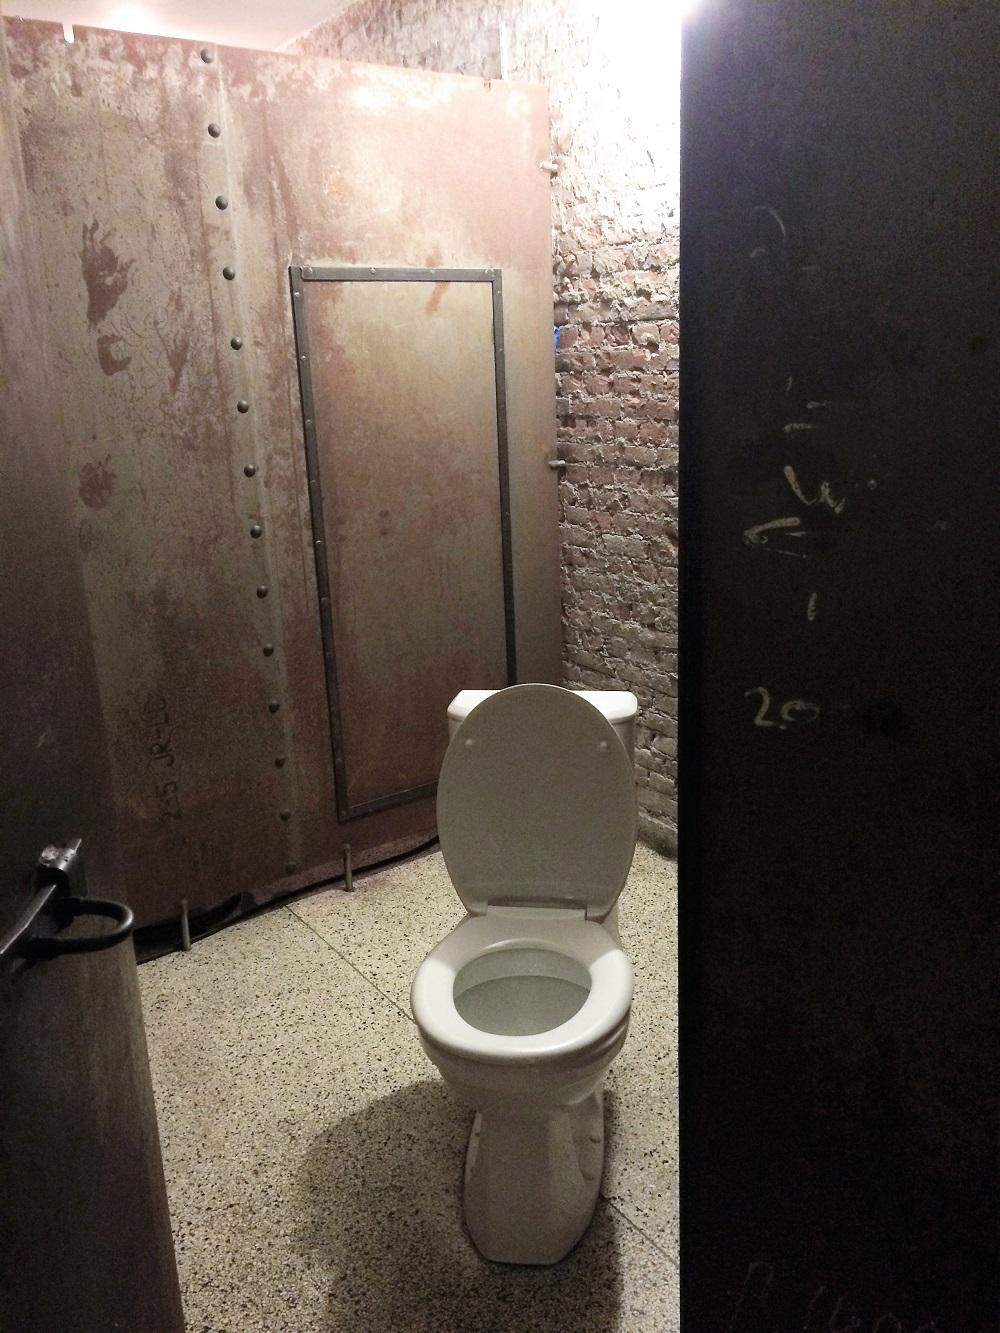 Toilet Felix Meritis